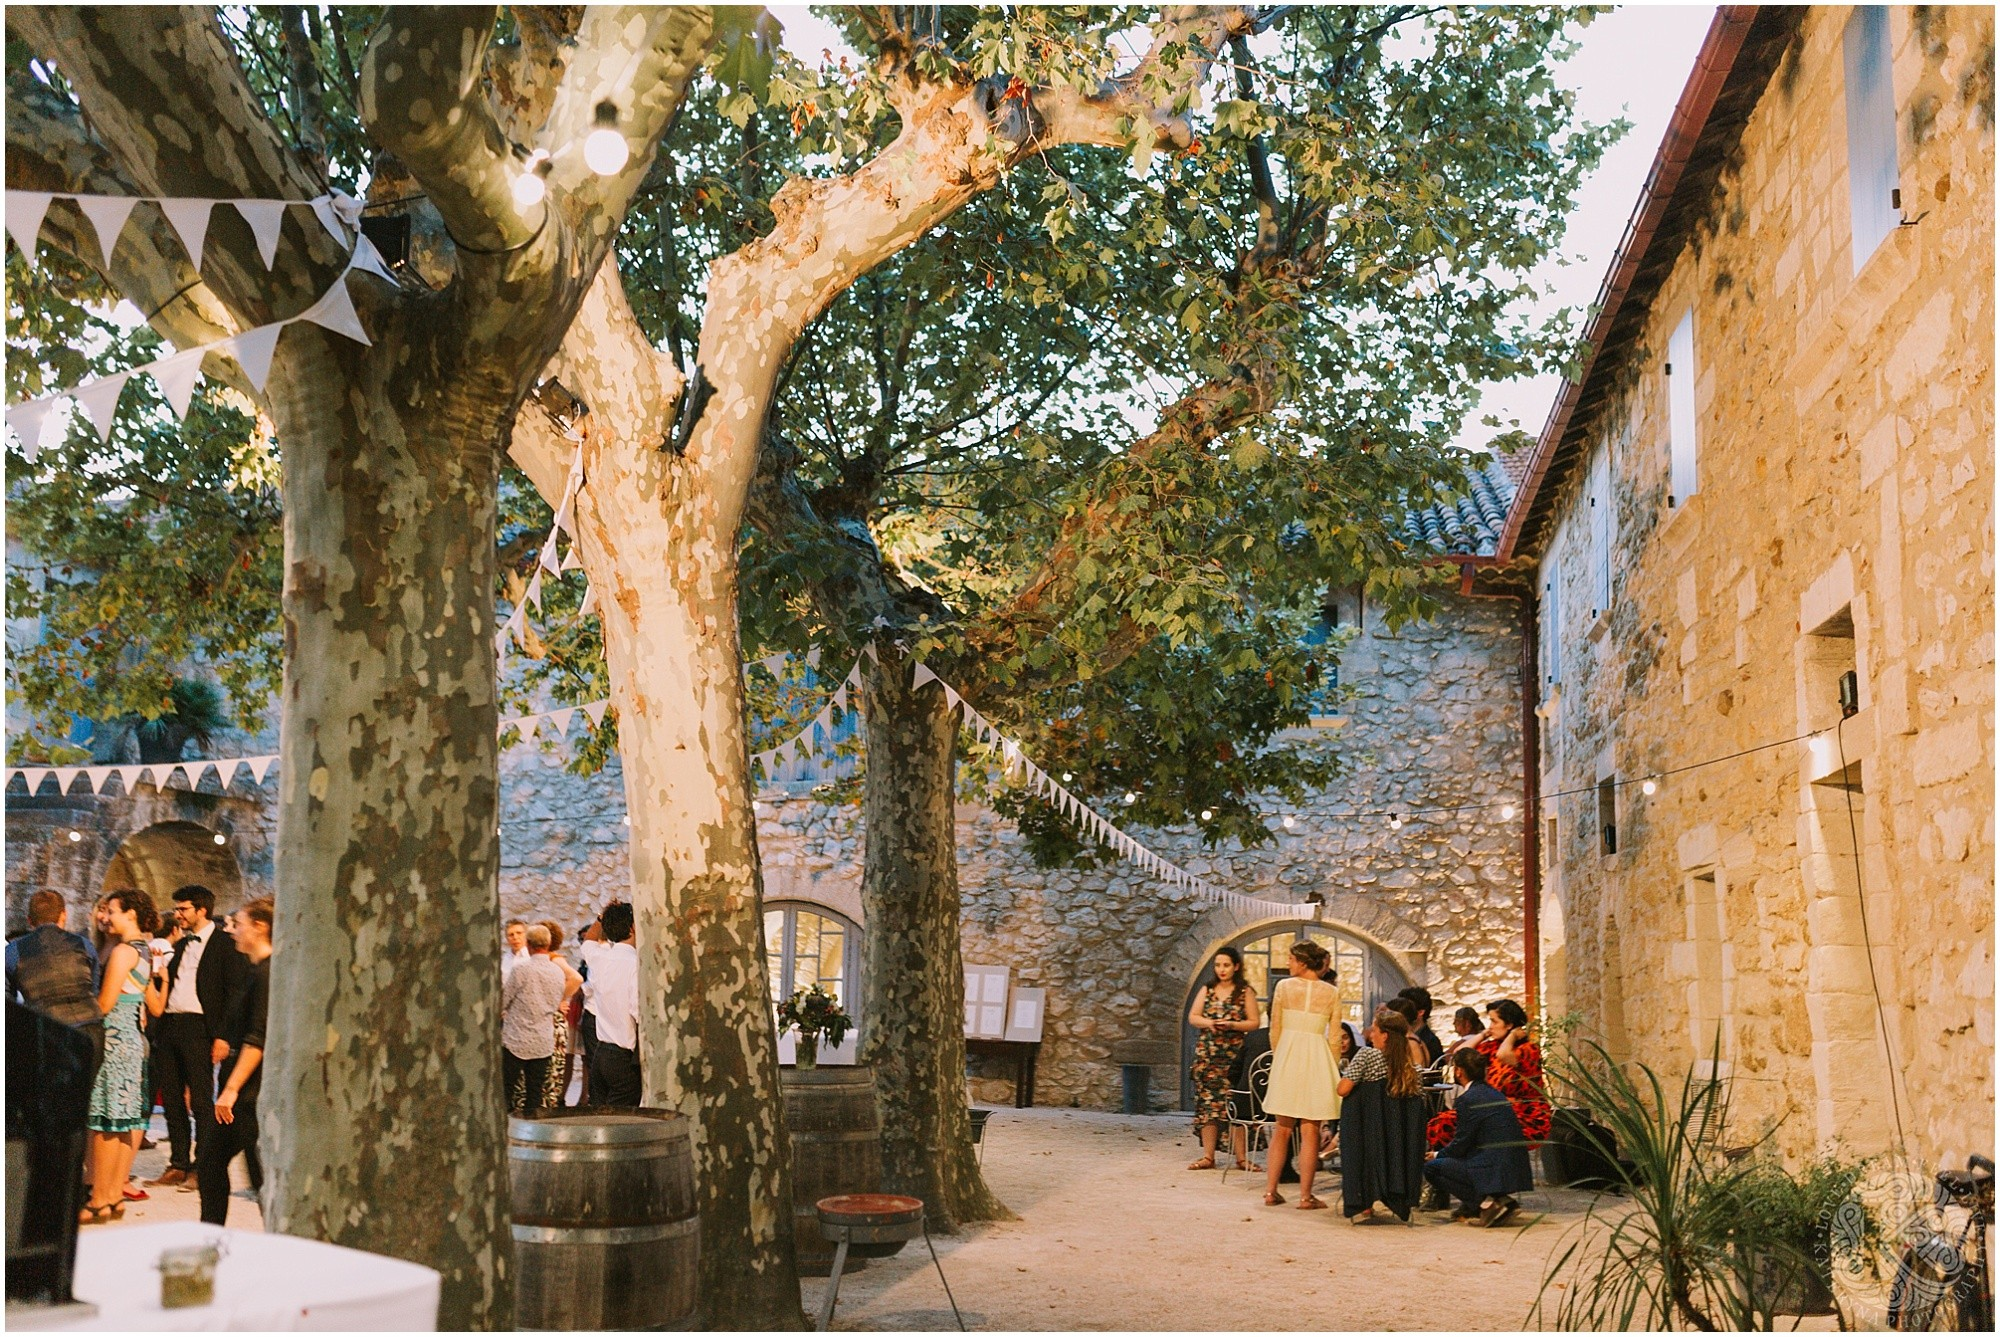 Kateryna-photos-photographe-mariage-vaucluse-provence-avignon-ferme-st-hugues_0092.jpg